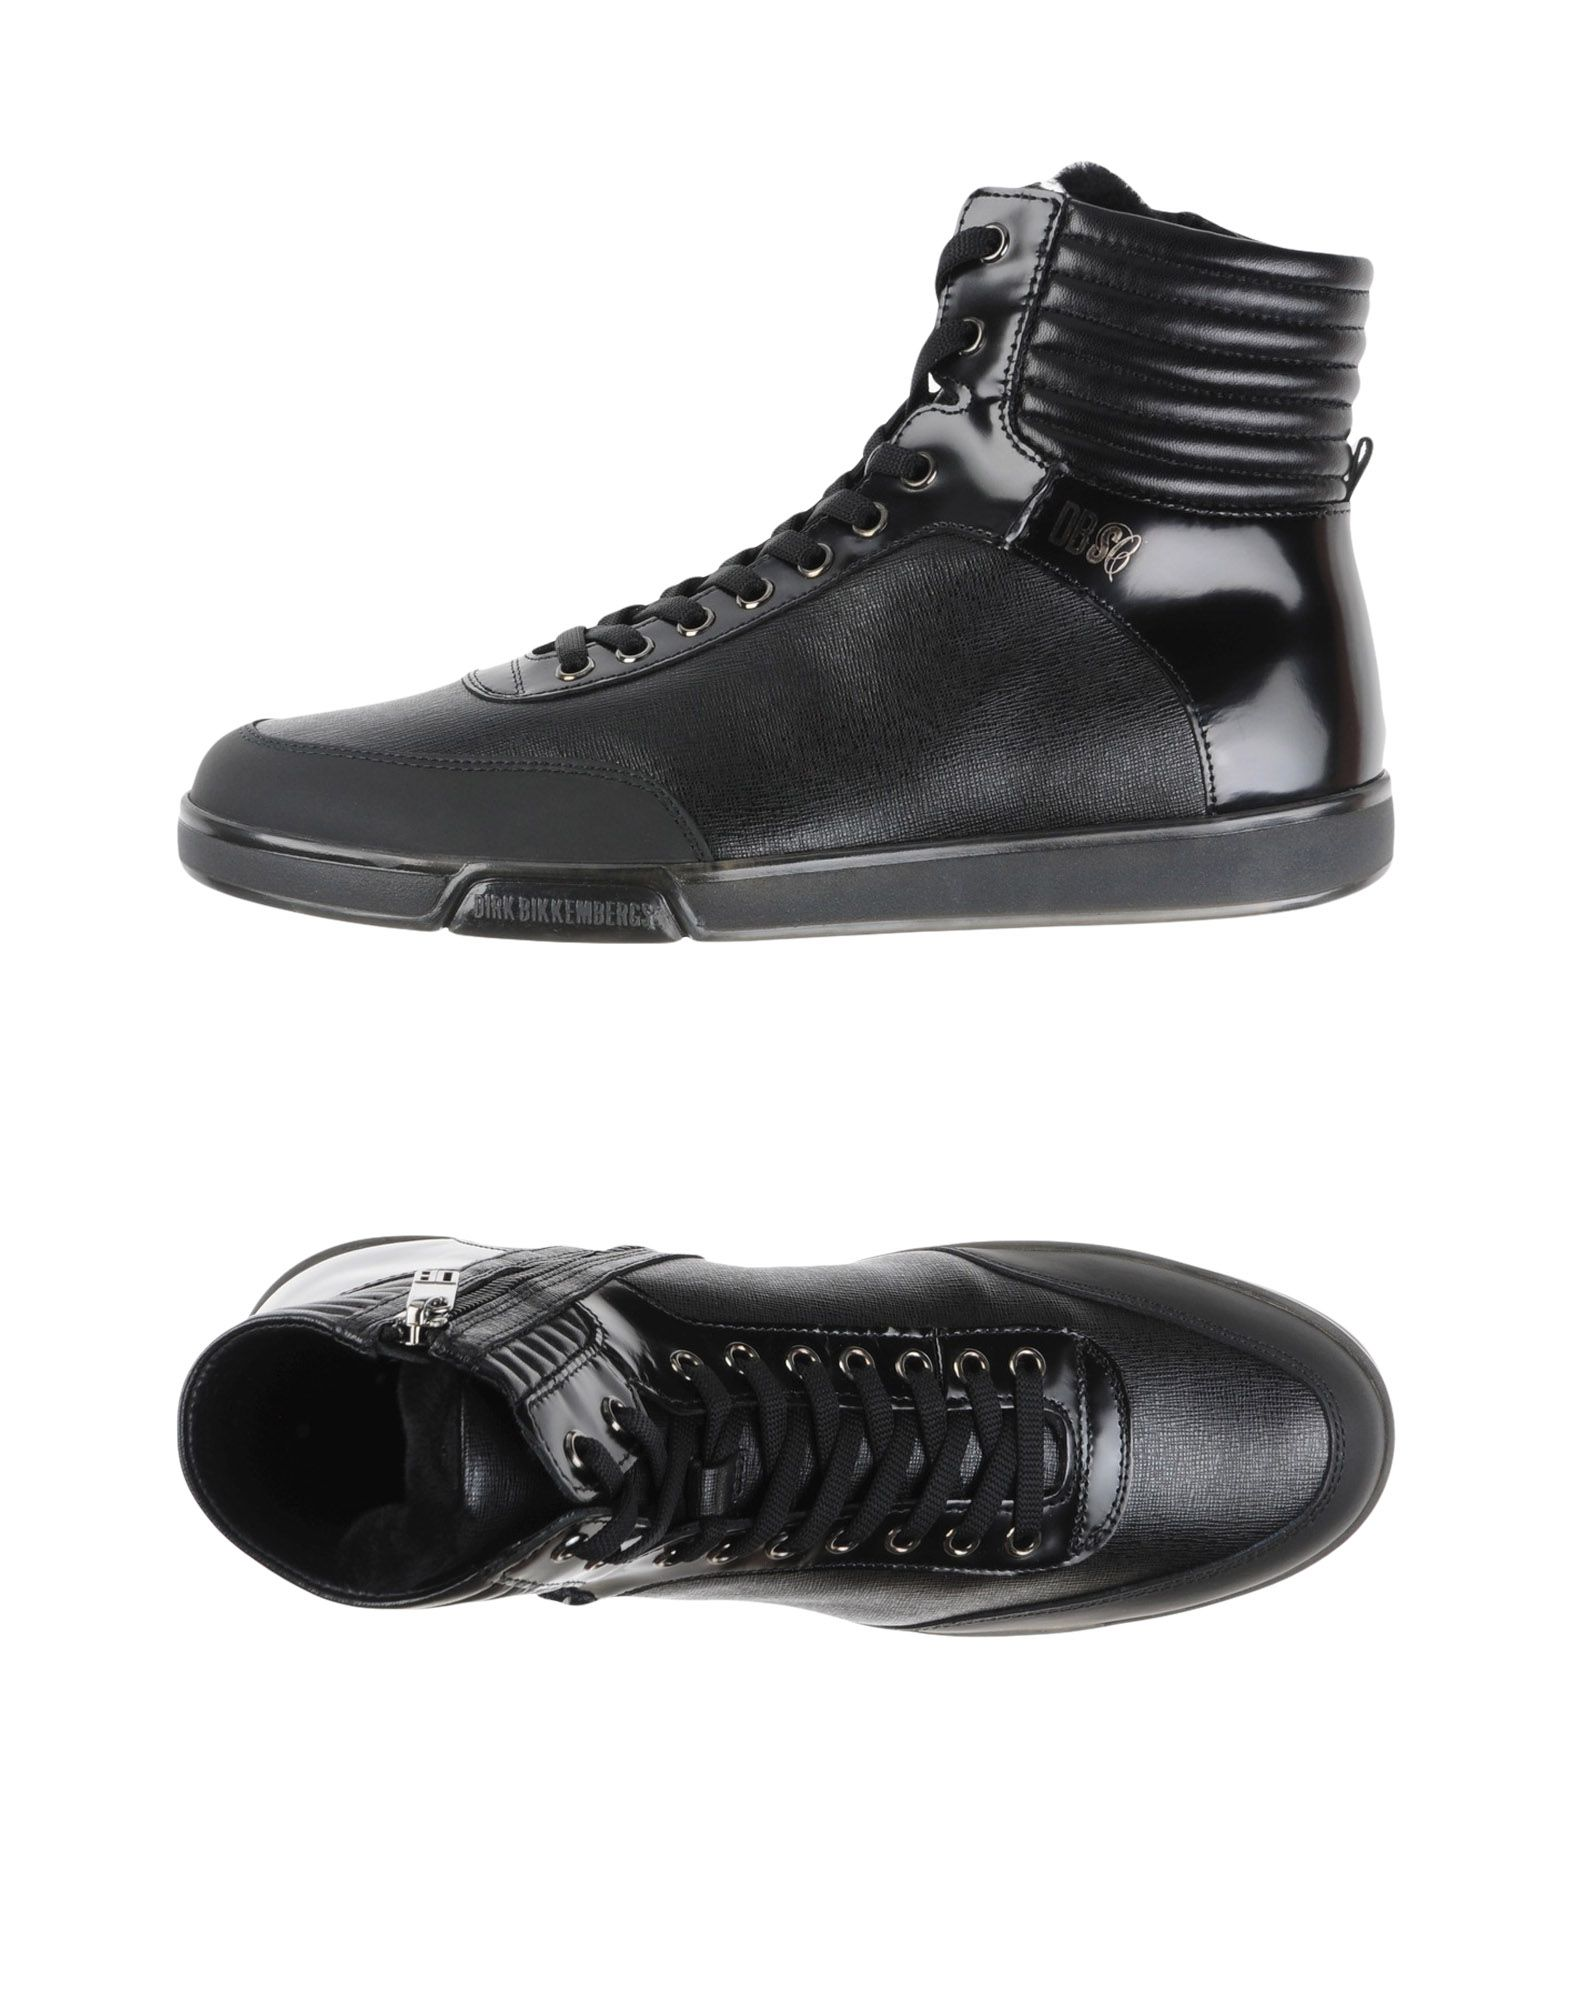 Dirk Bikkembergs Sneakers Sneakers - Men Dirk Bikkembergs Sneakers Sneakers online on  Canada - 11307512TL aaec00